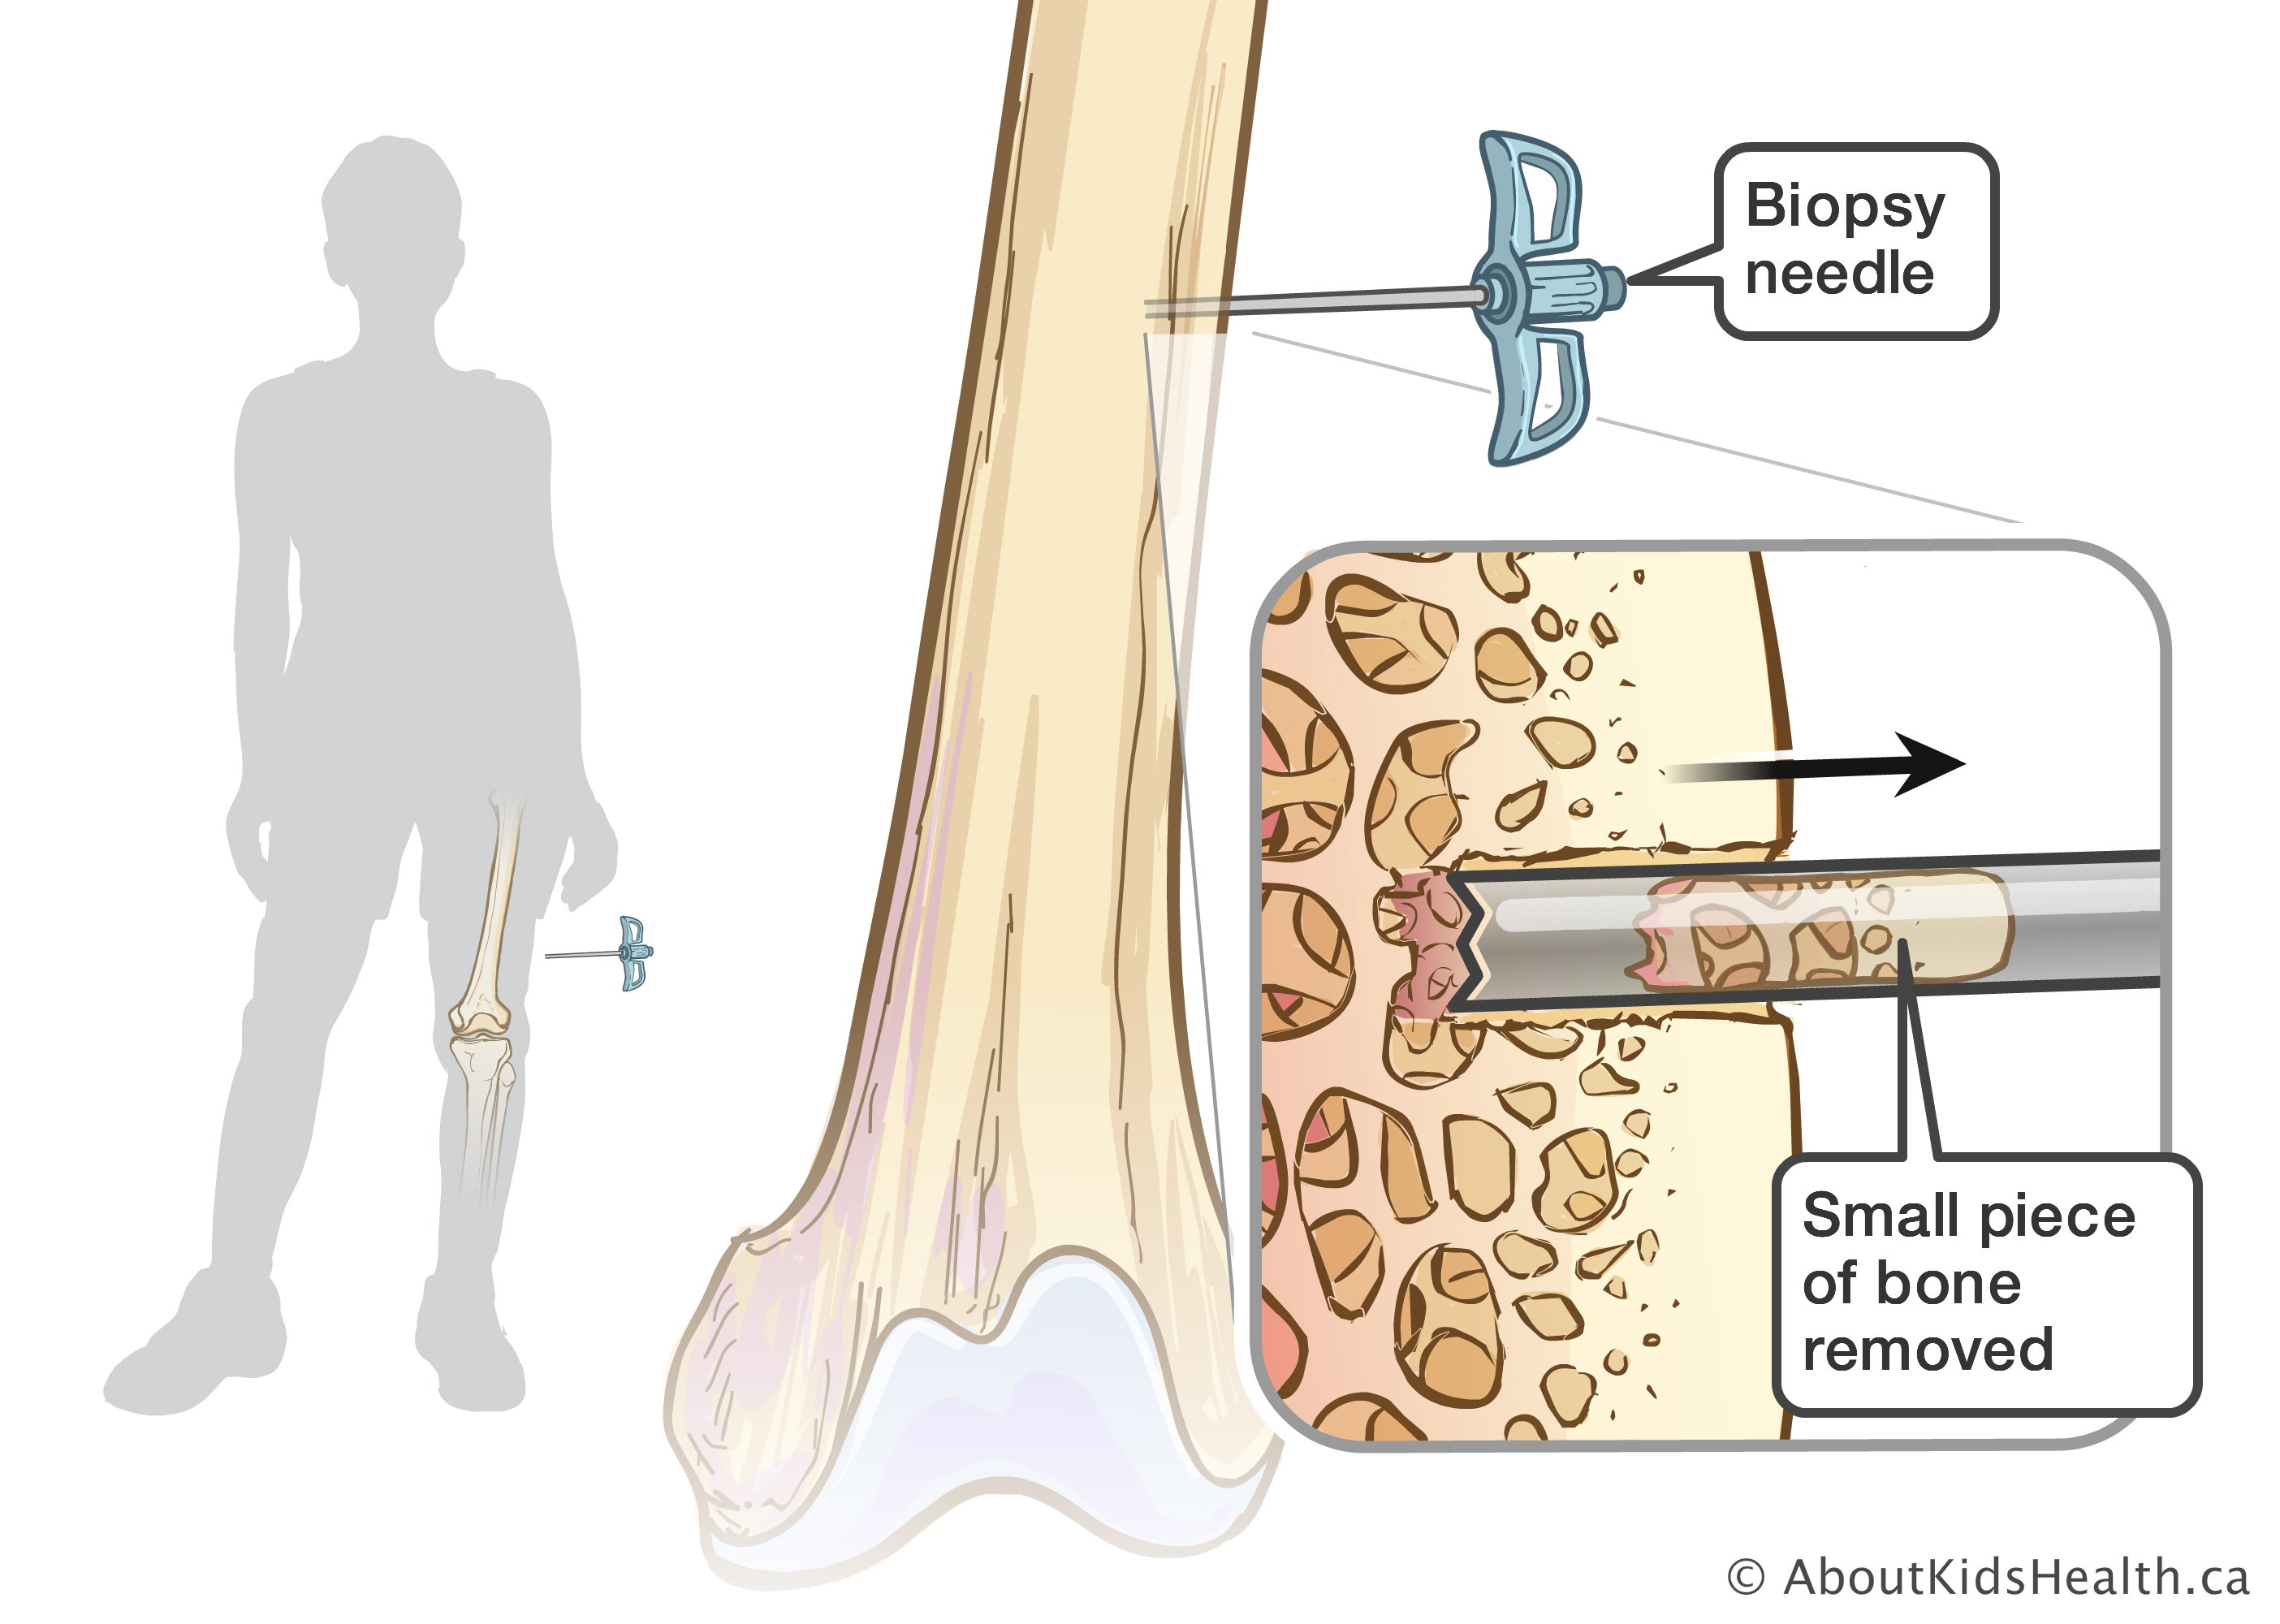 Bone biopsy using image guidance